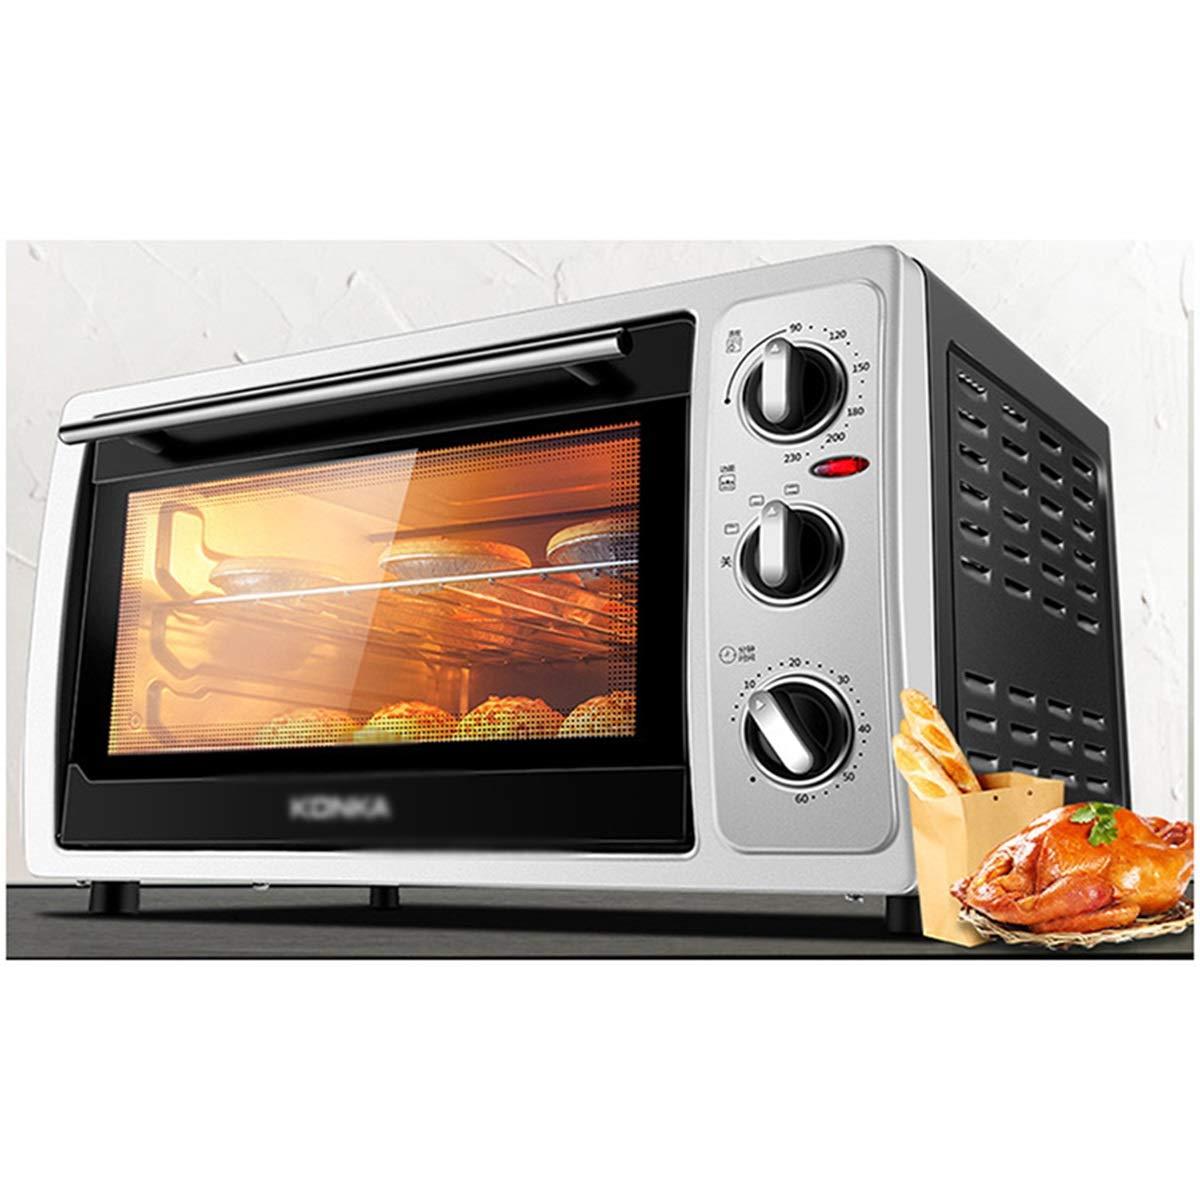 NZNB ミニオーブン - 電気オーブン家庭用多機能オーブンフルオート30 Lインチタッチノブミニオーブン - オーブントースター   B07R469LW8